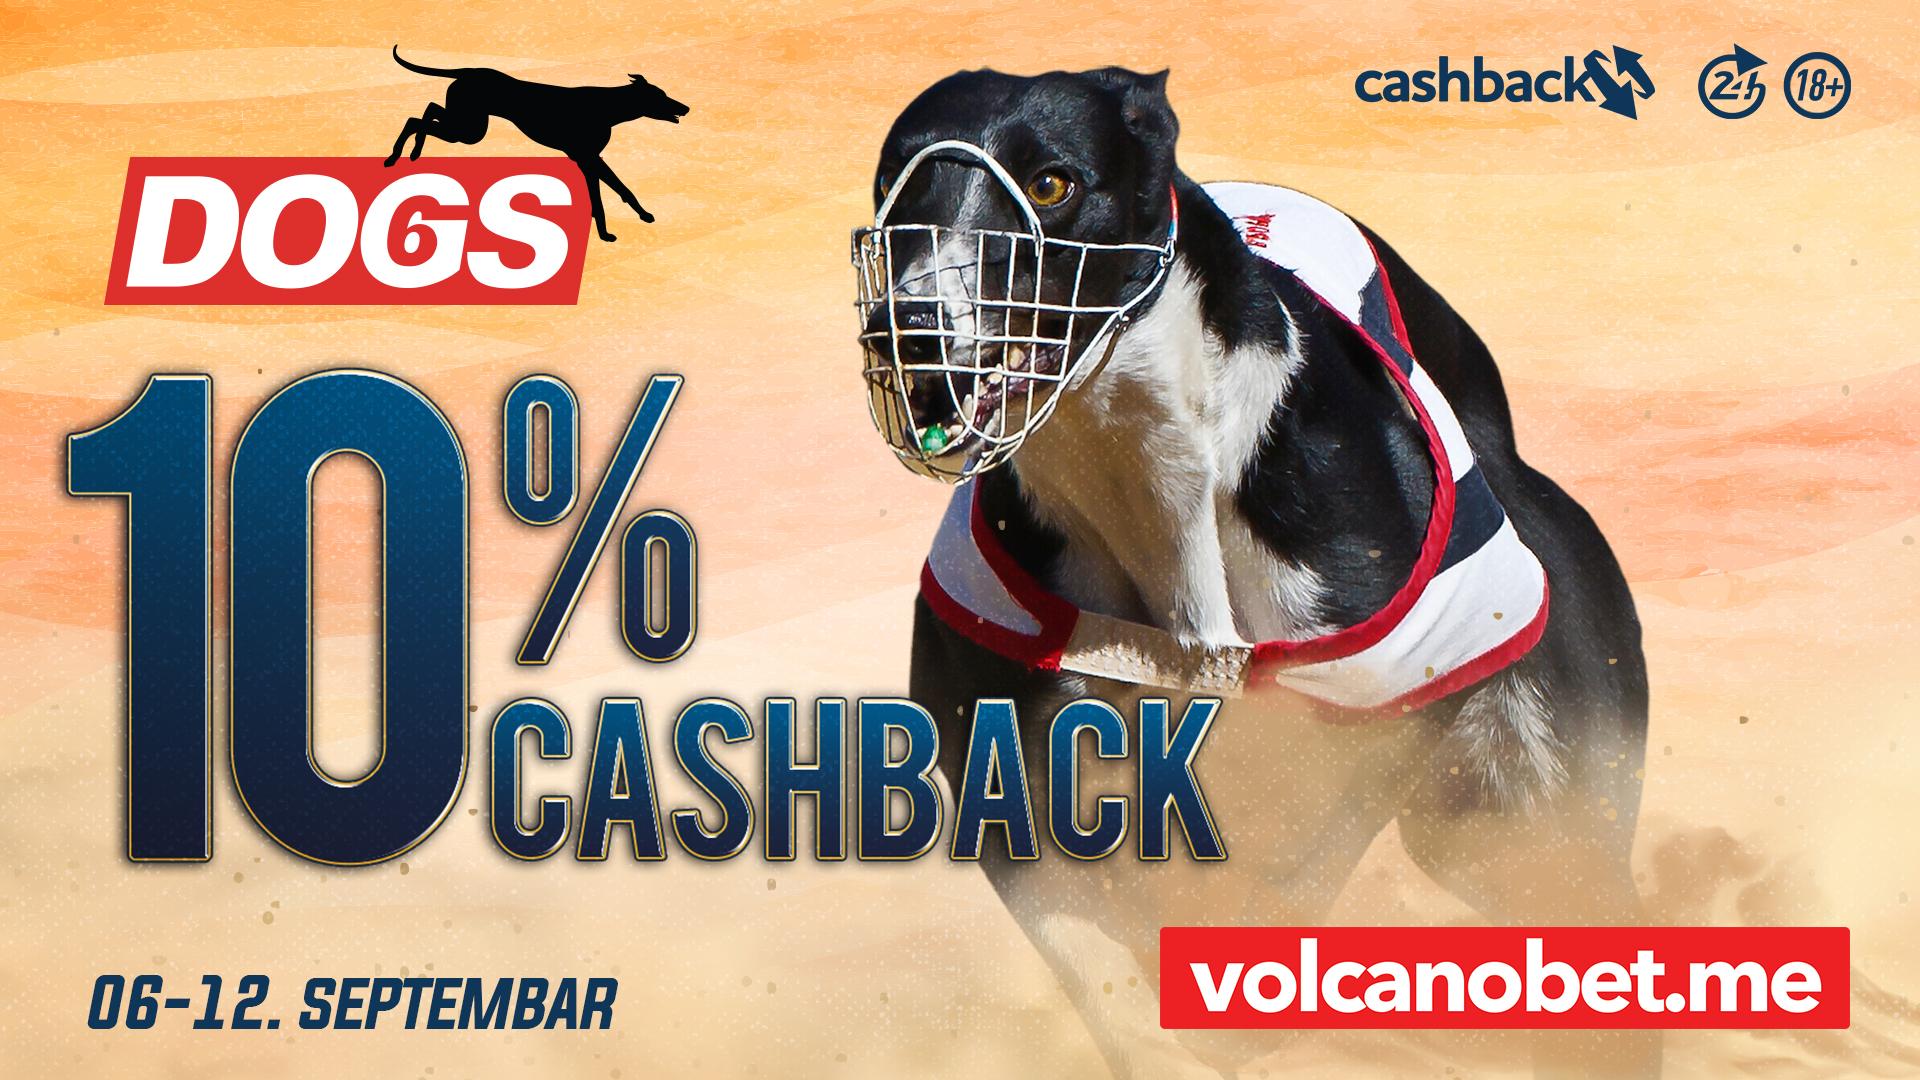 Dogs Cashback Septembar